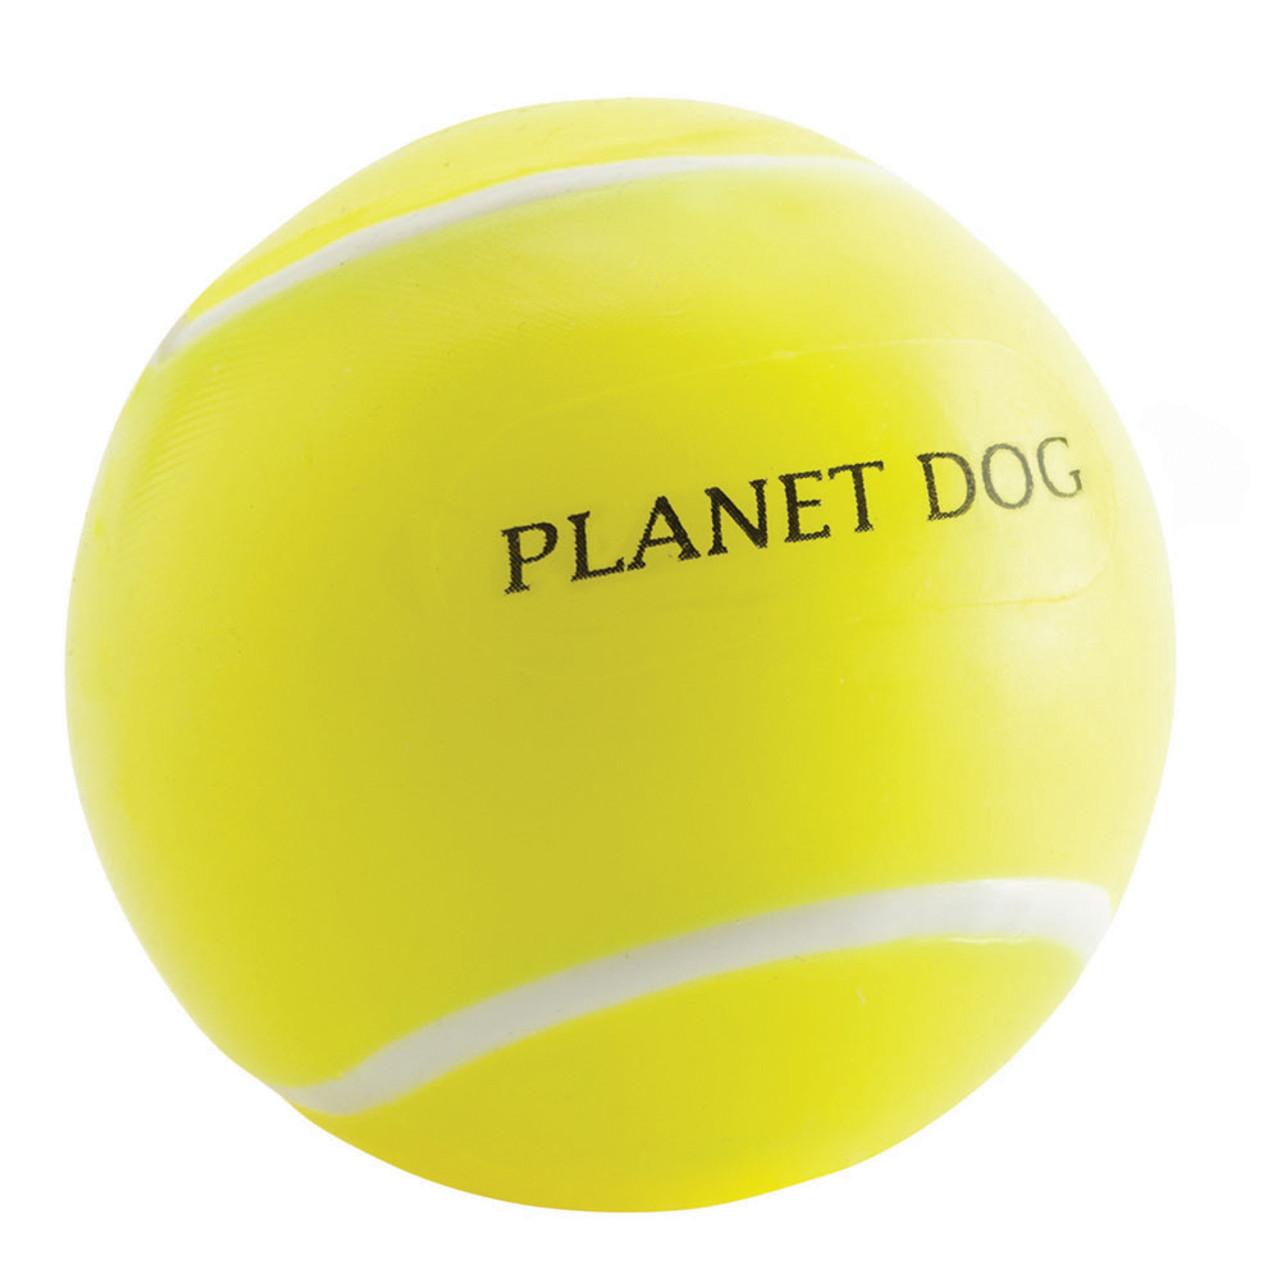 Planet Dog Orbee-Tuff Tennis Ball Dog Toy